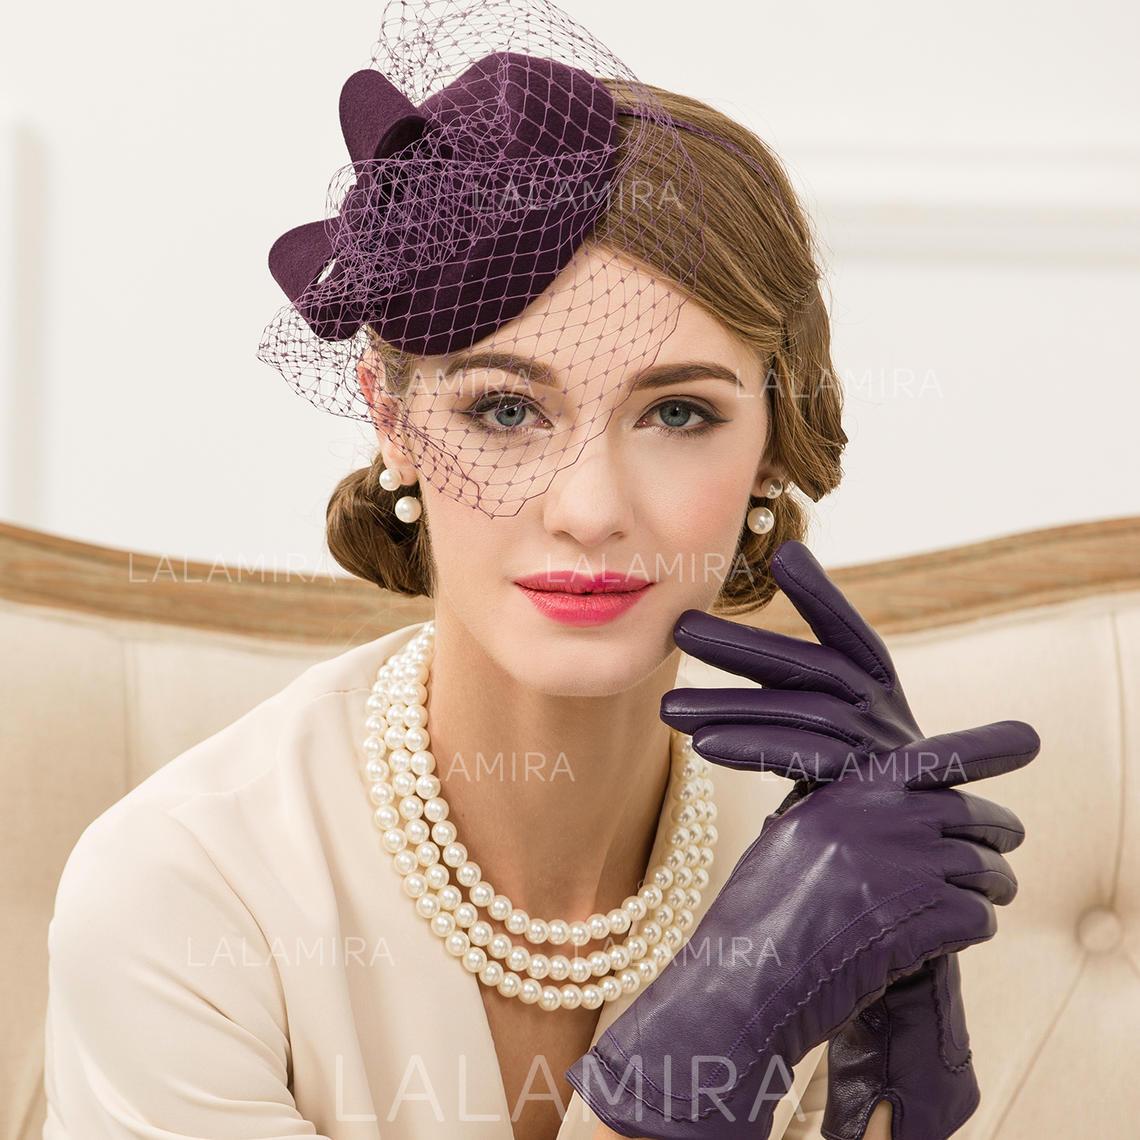 c48a4837ea0f5 Wool With Tulle Fascinators Vintage Ladies' Hats (196194269). Loading zoom